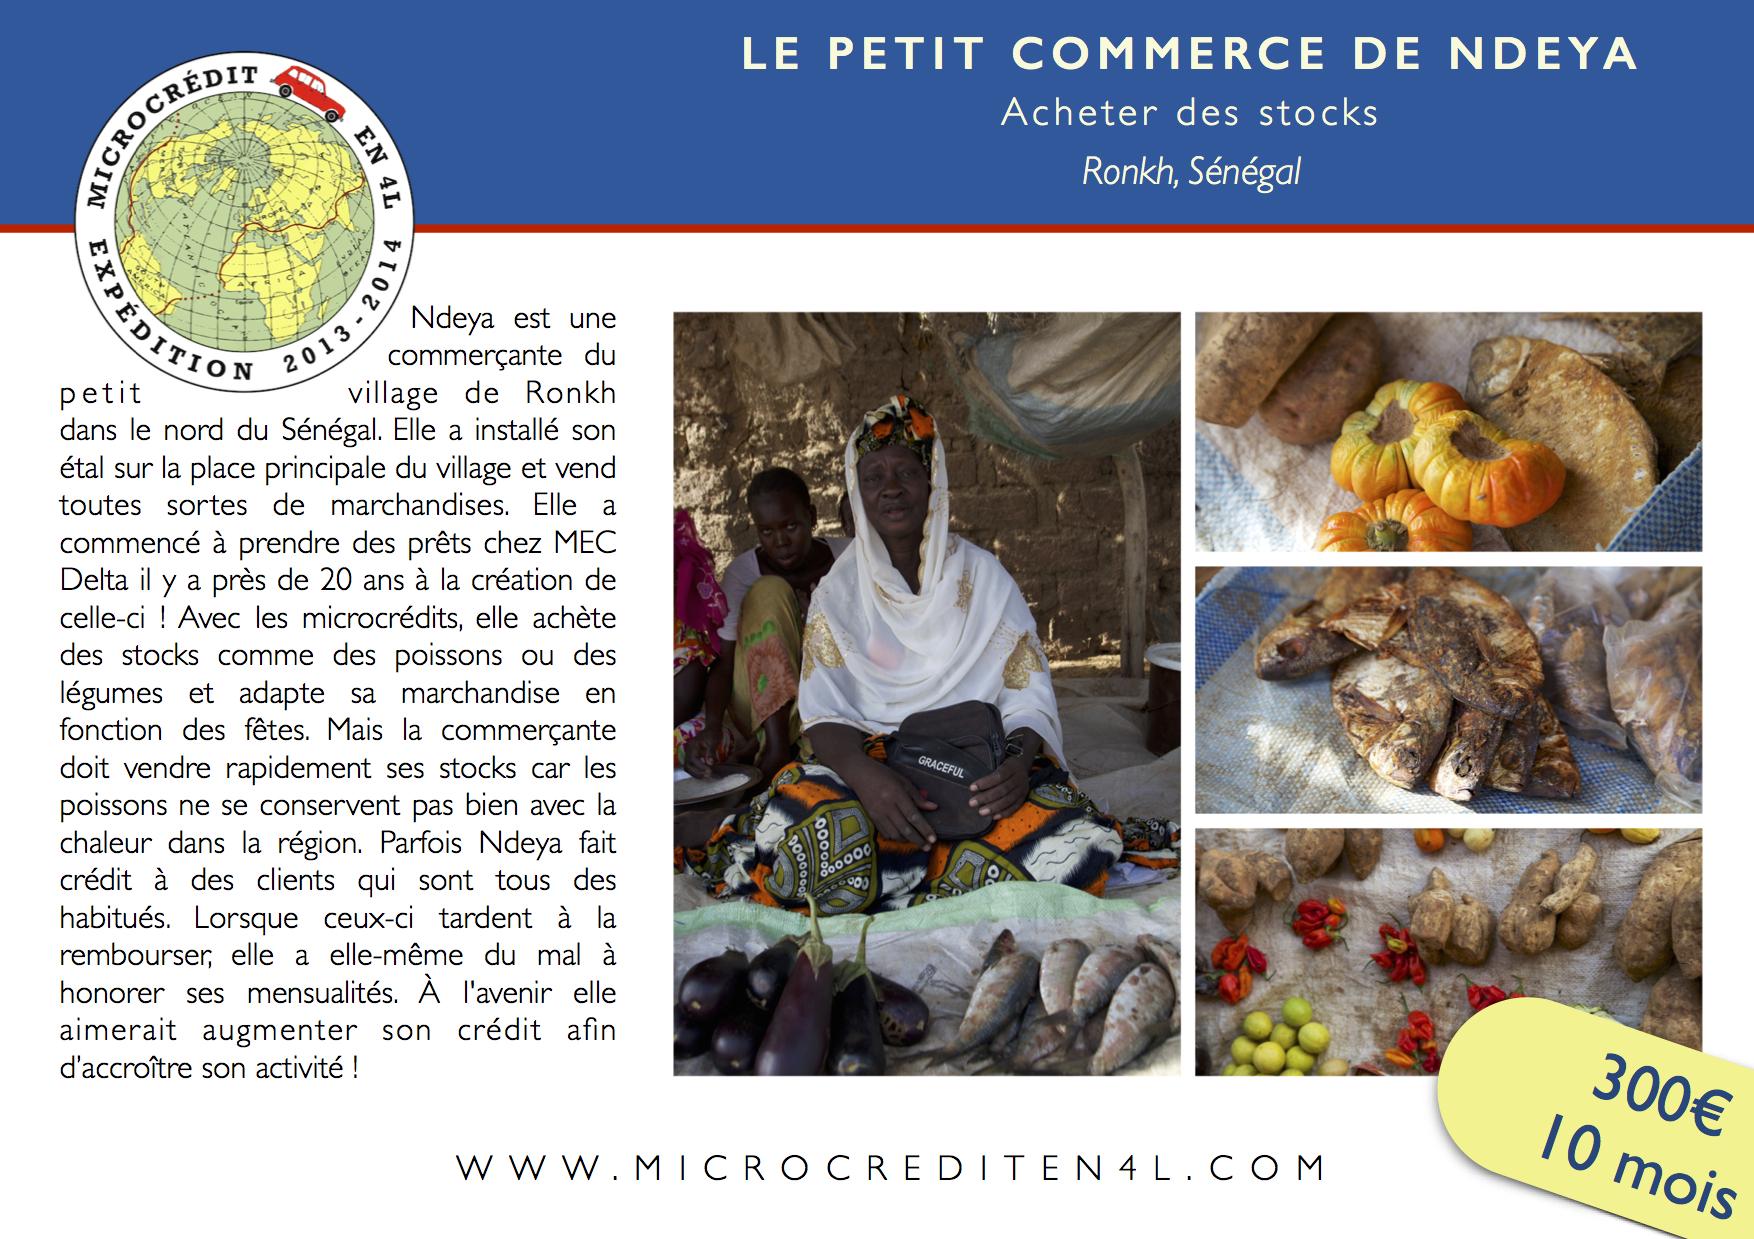 Le Petit Commerce de Ndeya